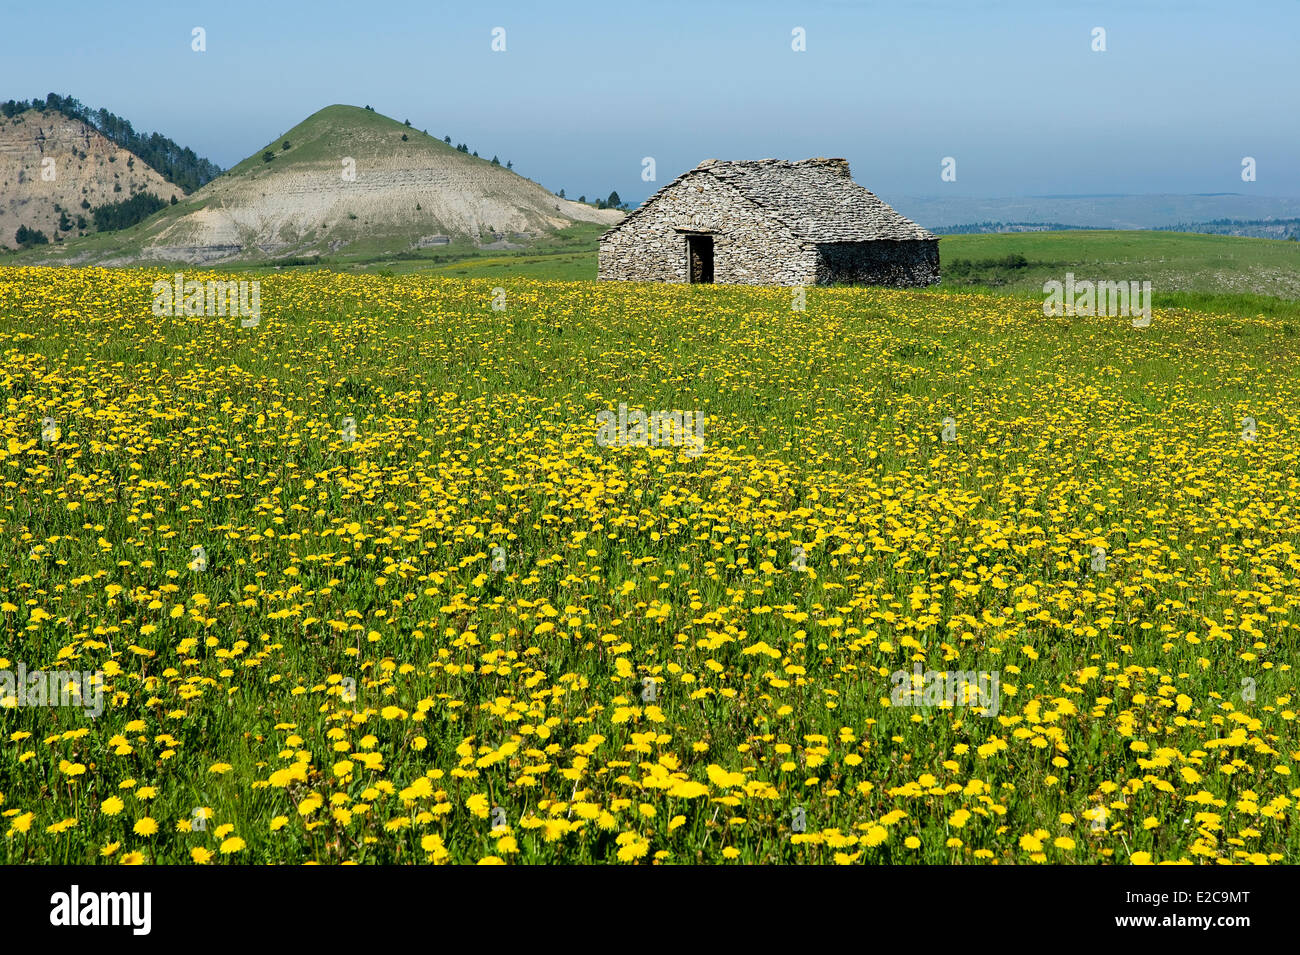 France, Lozere, Les Bondons, the puech or hills detrital - Stock Image